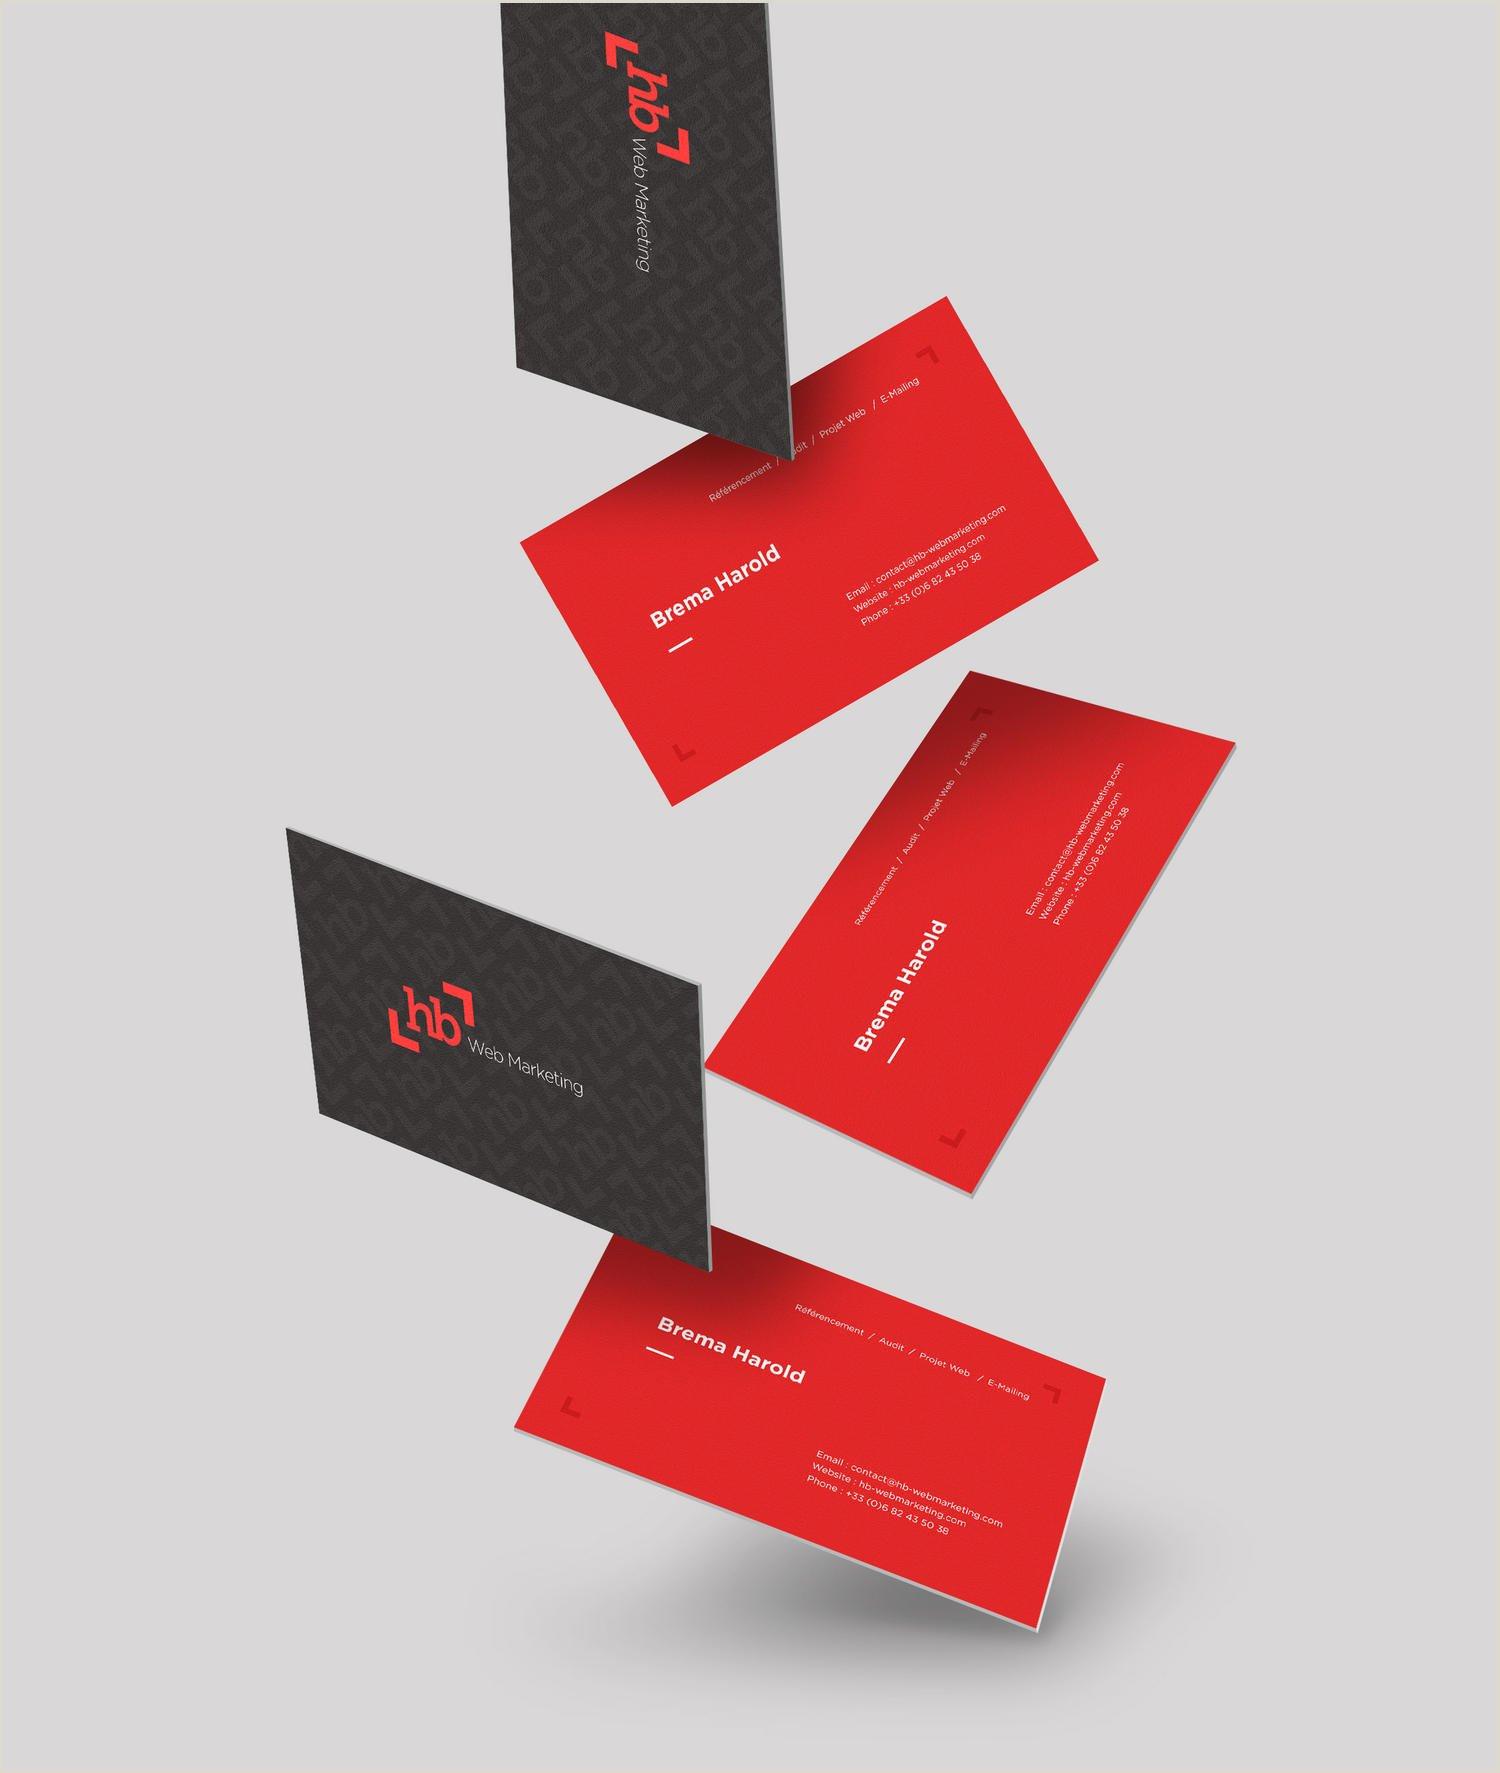 Designing A Business Card Business Card Design By Alanaragondesign On Envato Studio